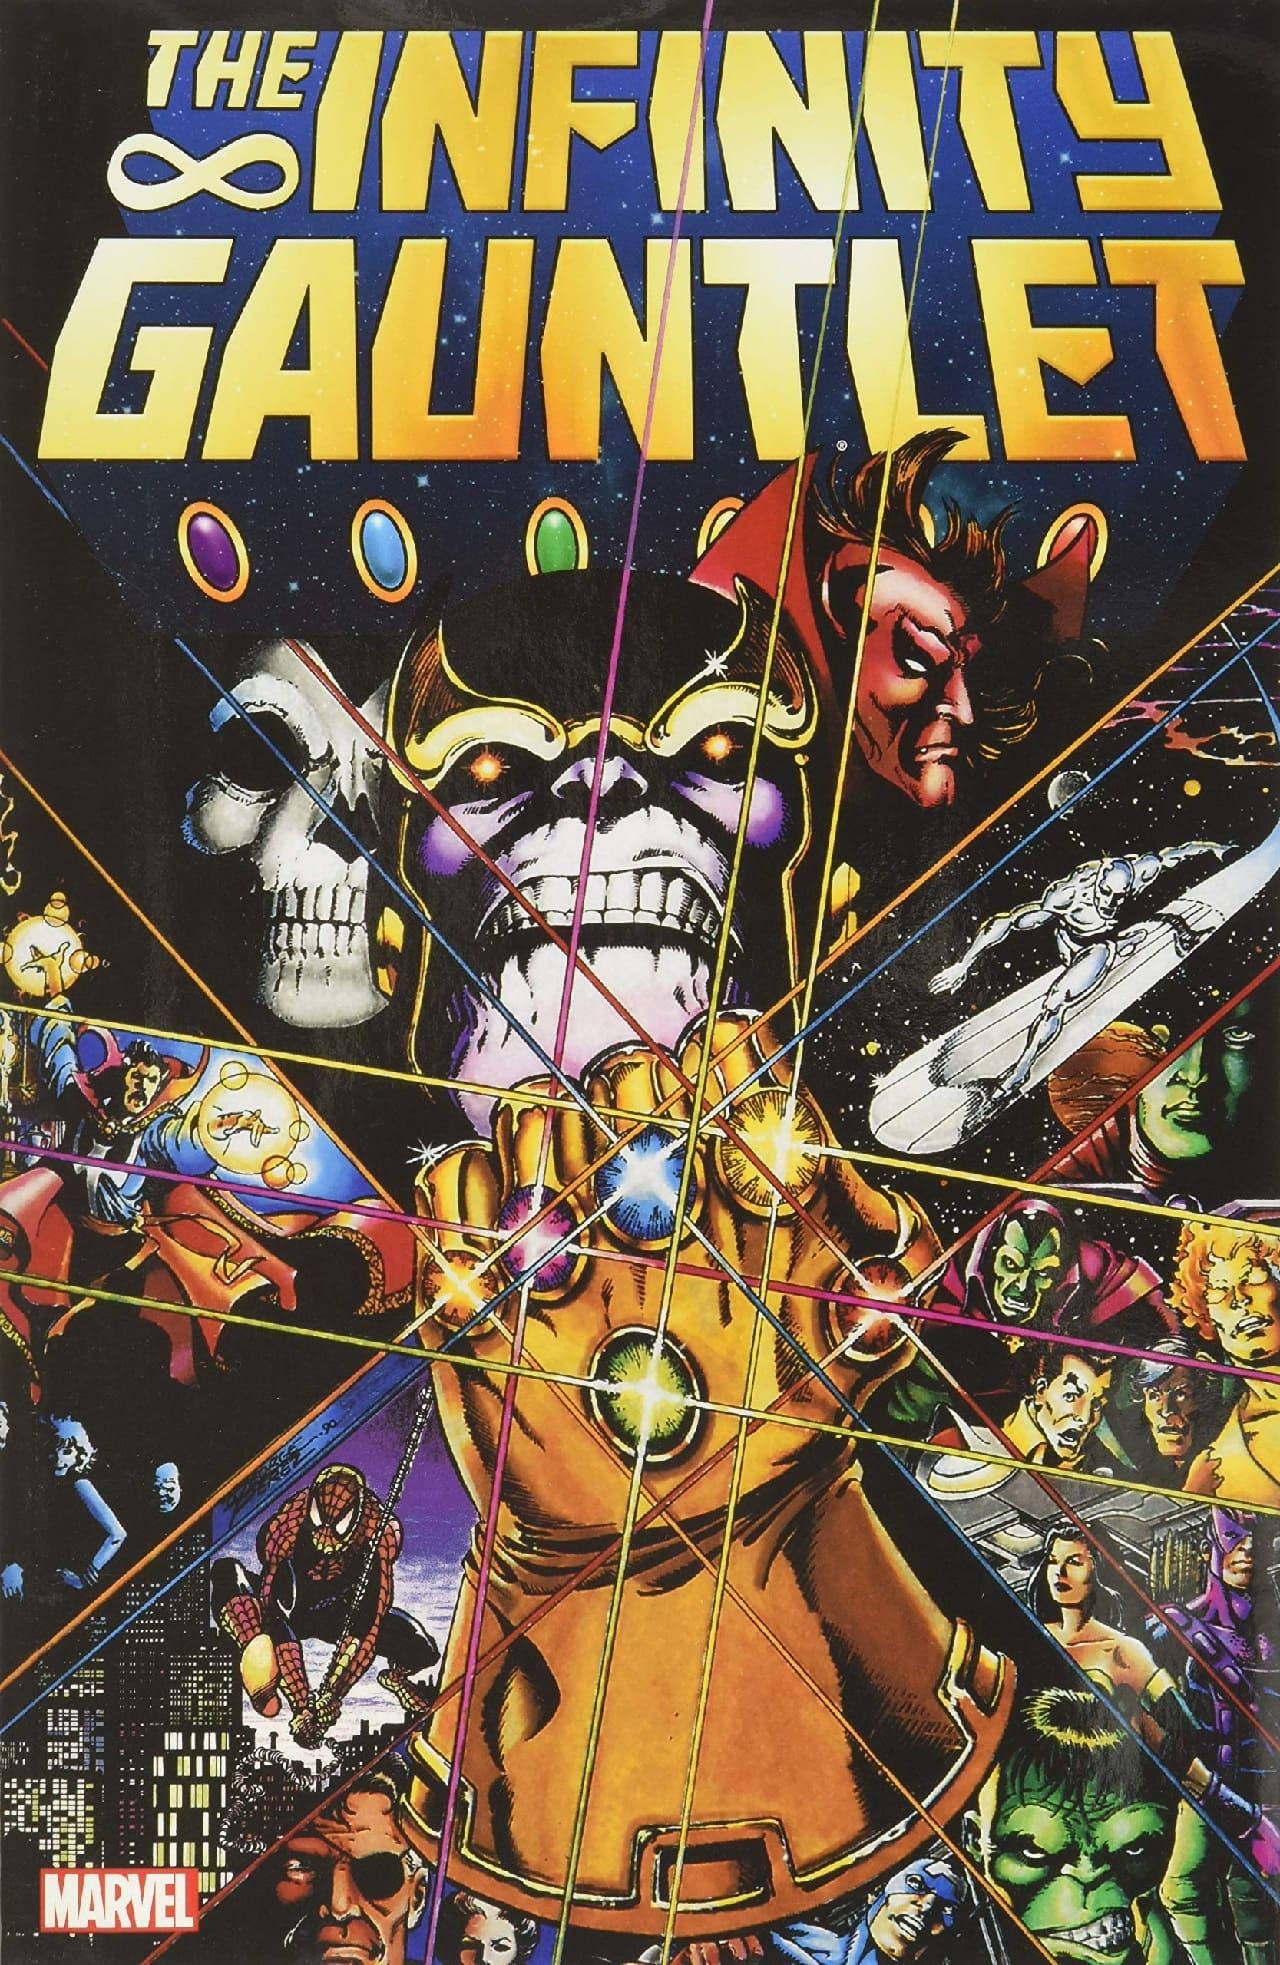 thanos guantelete infinito marvel comics